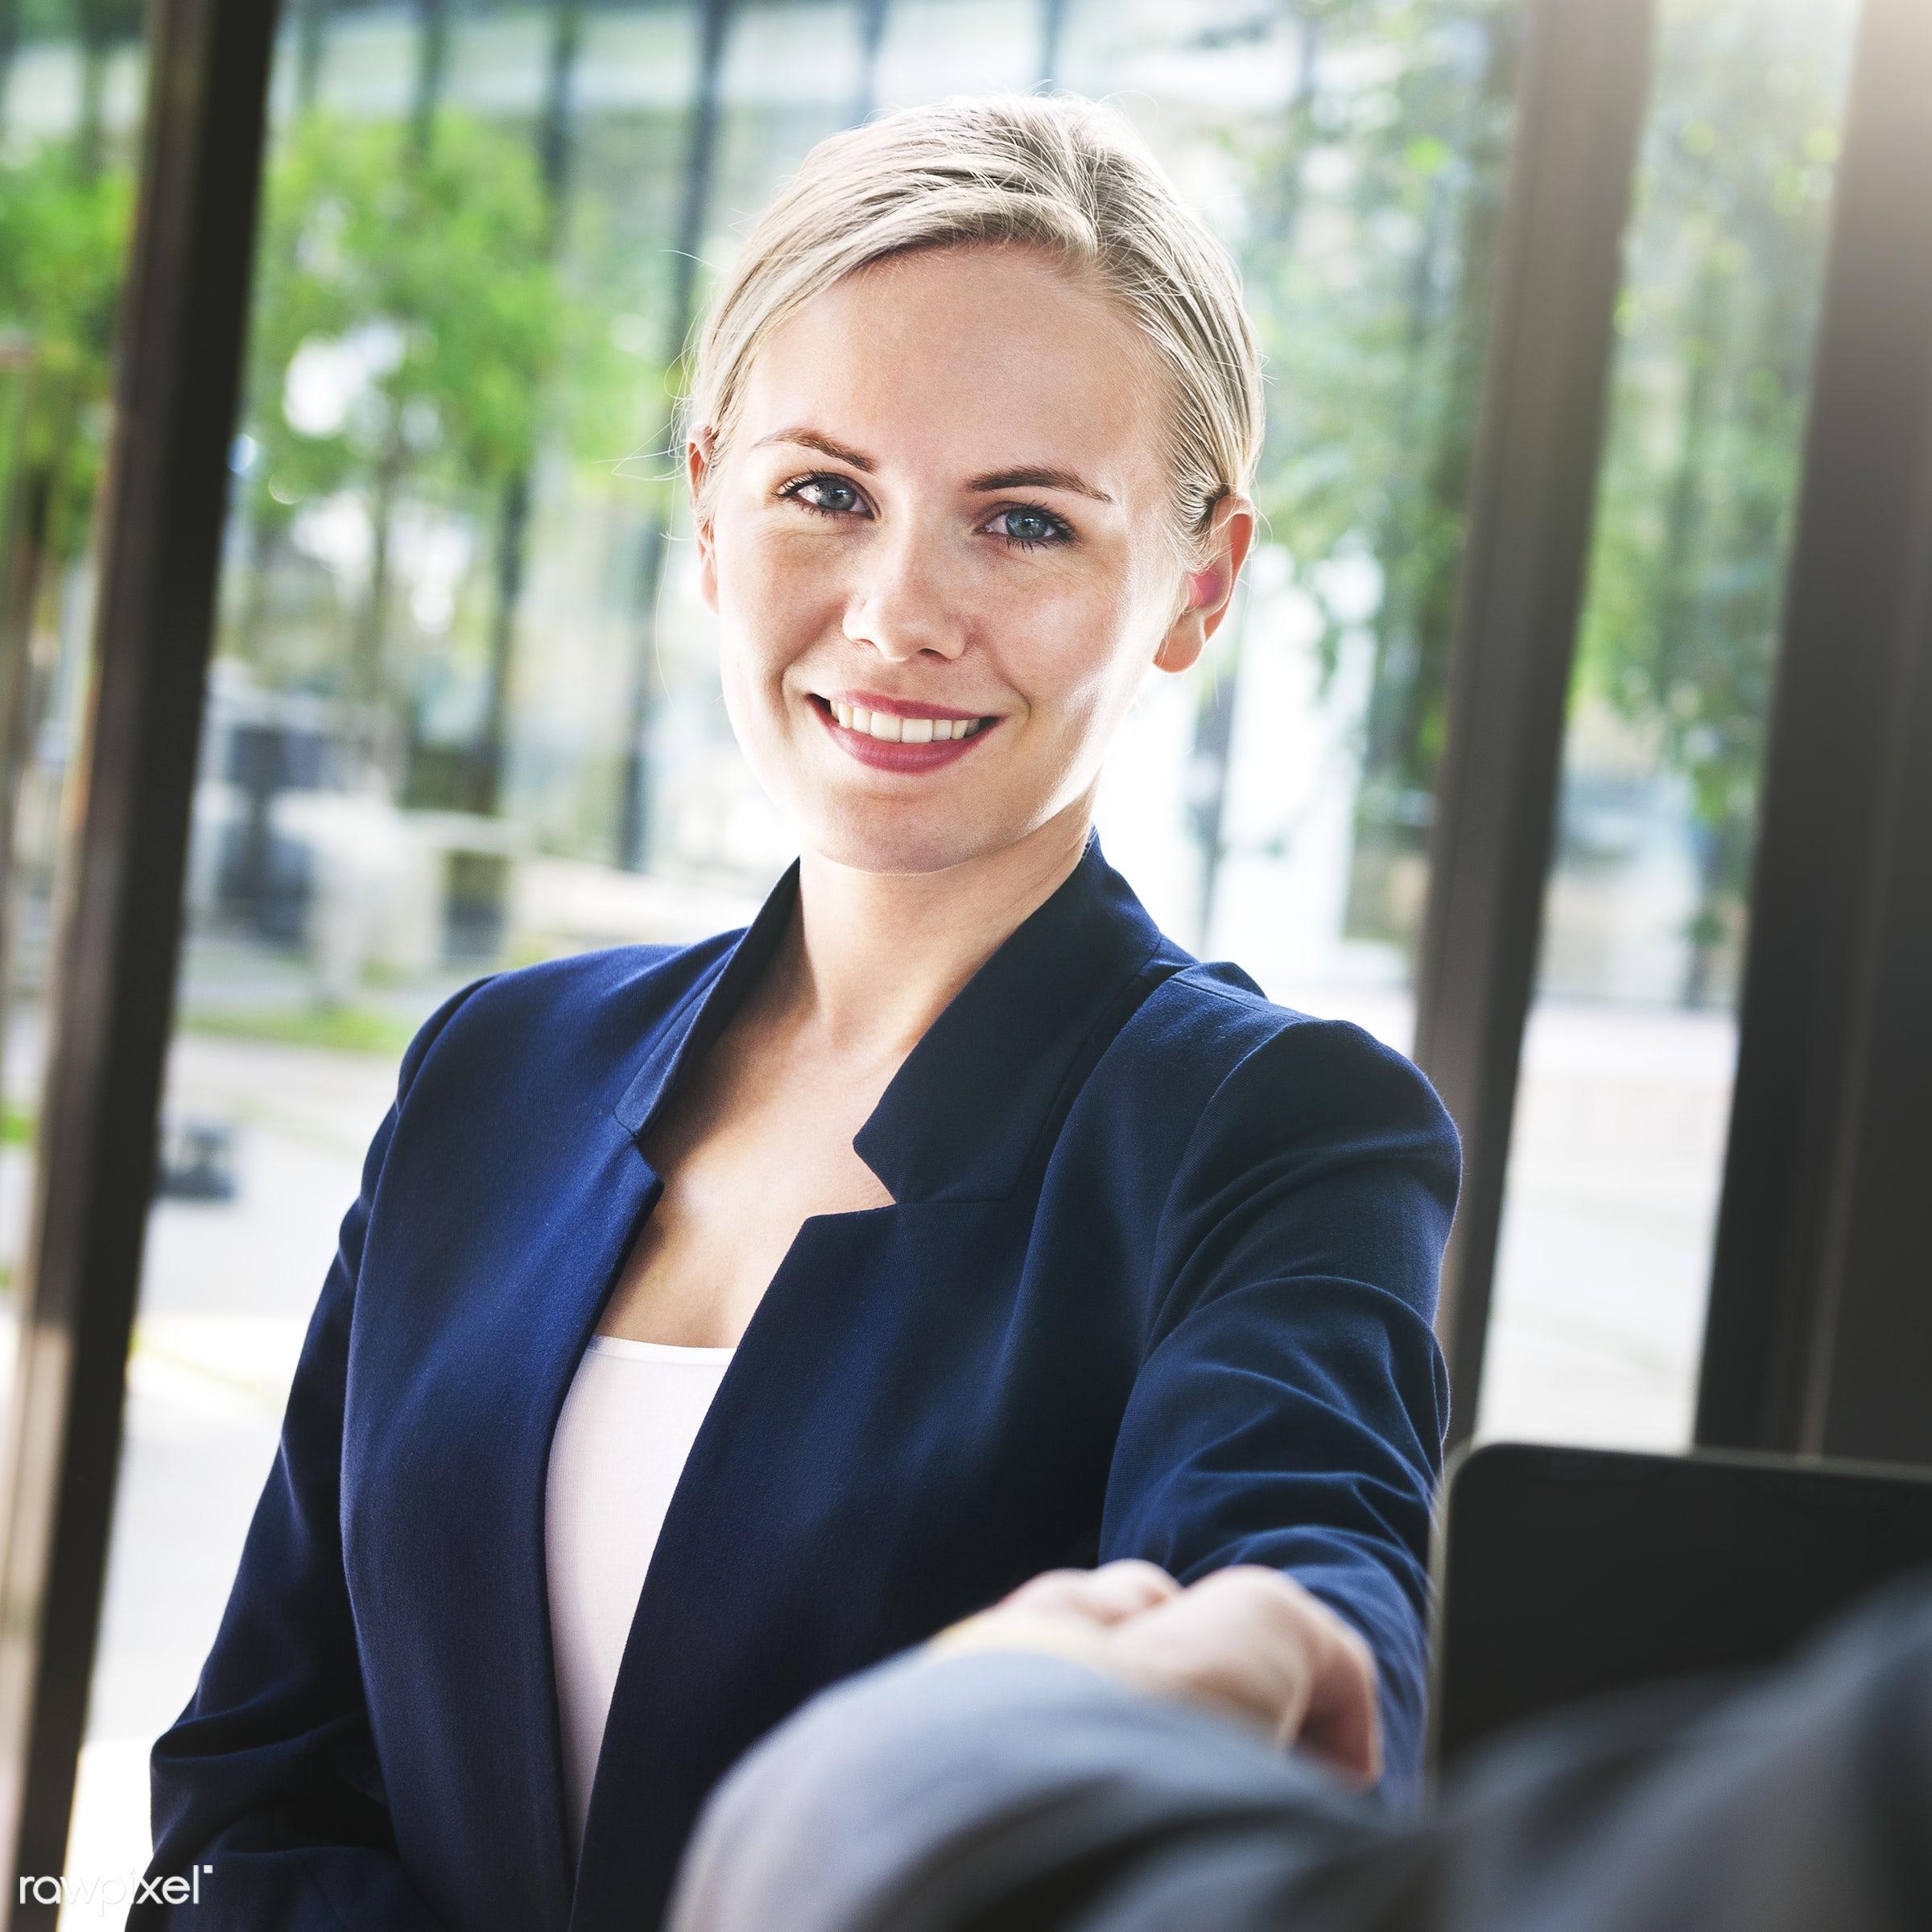 achievement, agreement, beginning, business, business person, business relationship, businesswoman, cheerful, communication...